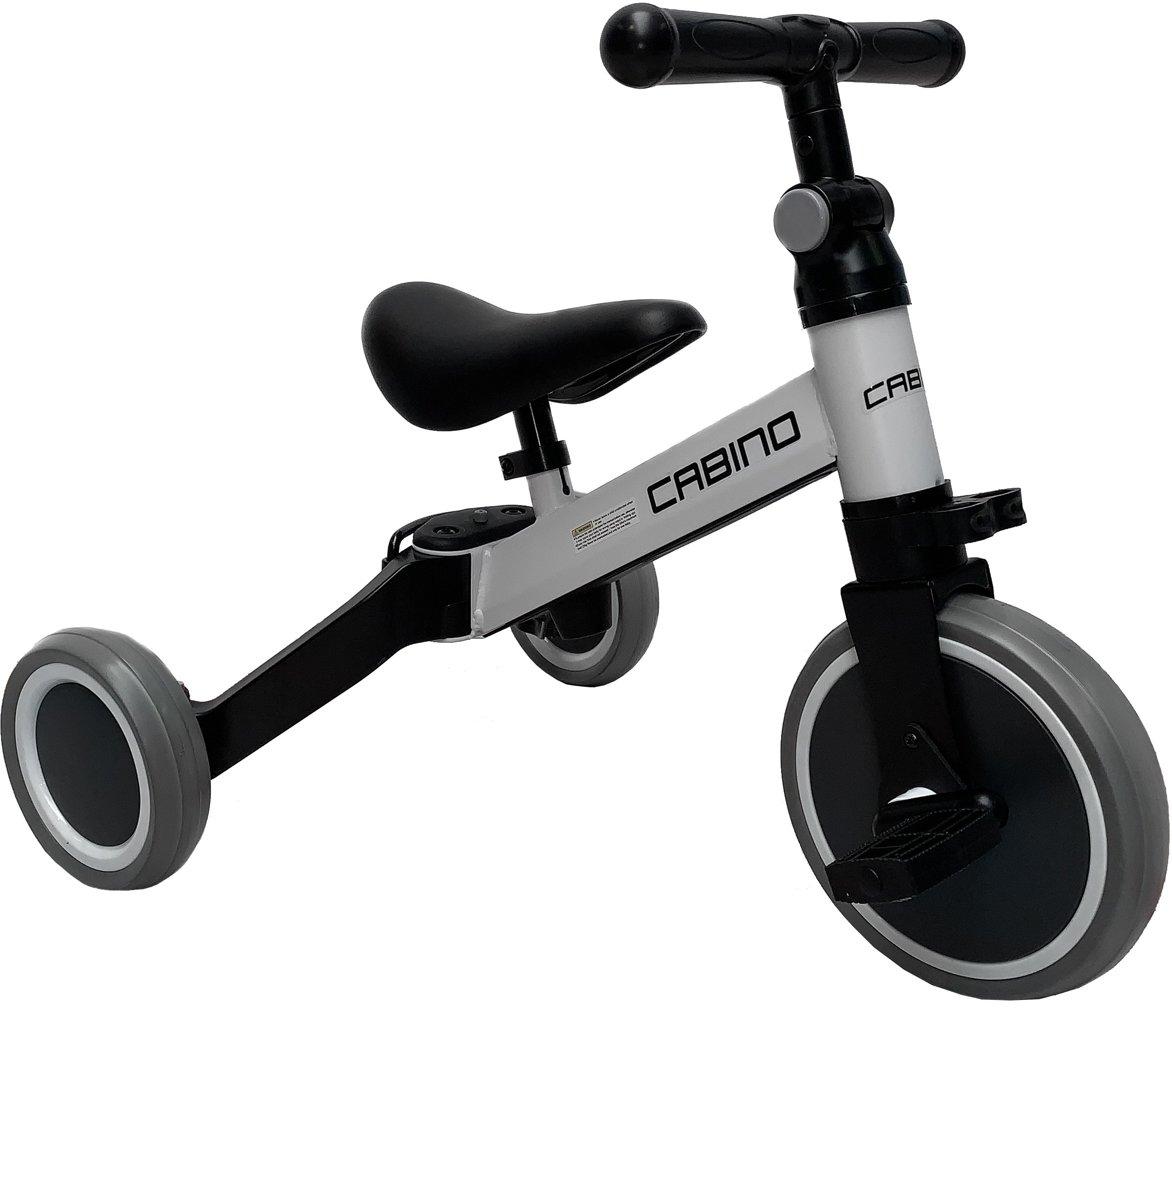 Cabino loopfiets driewieler kopen